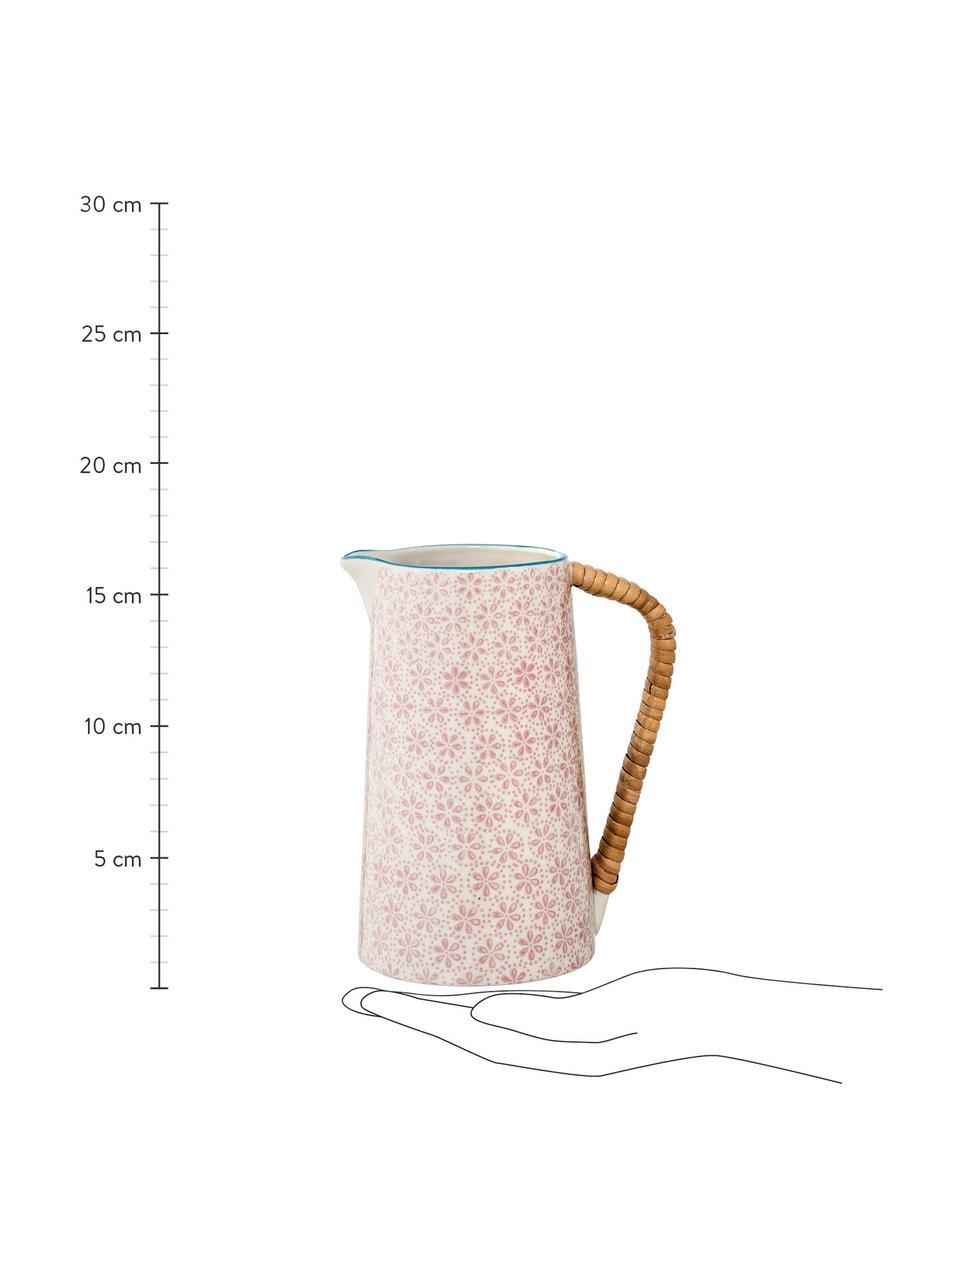 Brocca acqua in gres dipinta a mano Patrizia, 800 ml, Brocca: gres, Manico: bambù, Rosa, 800 ml